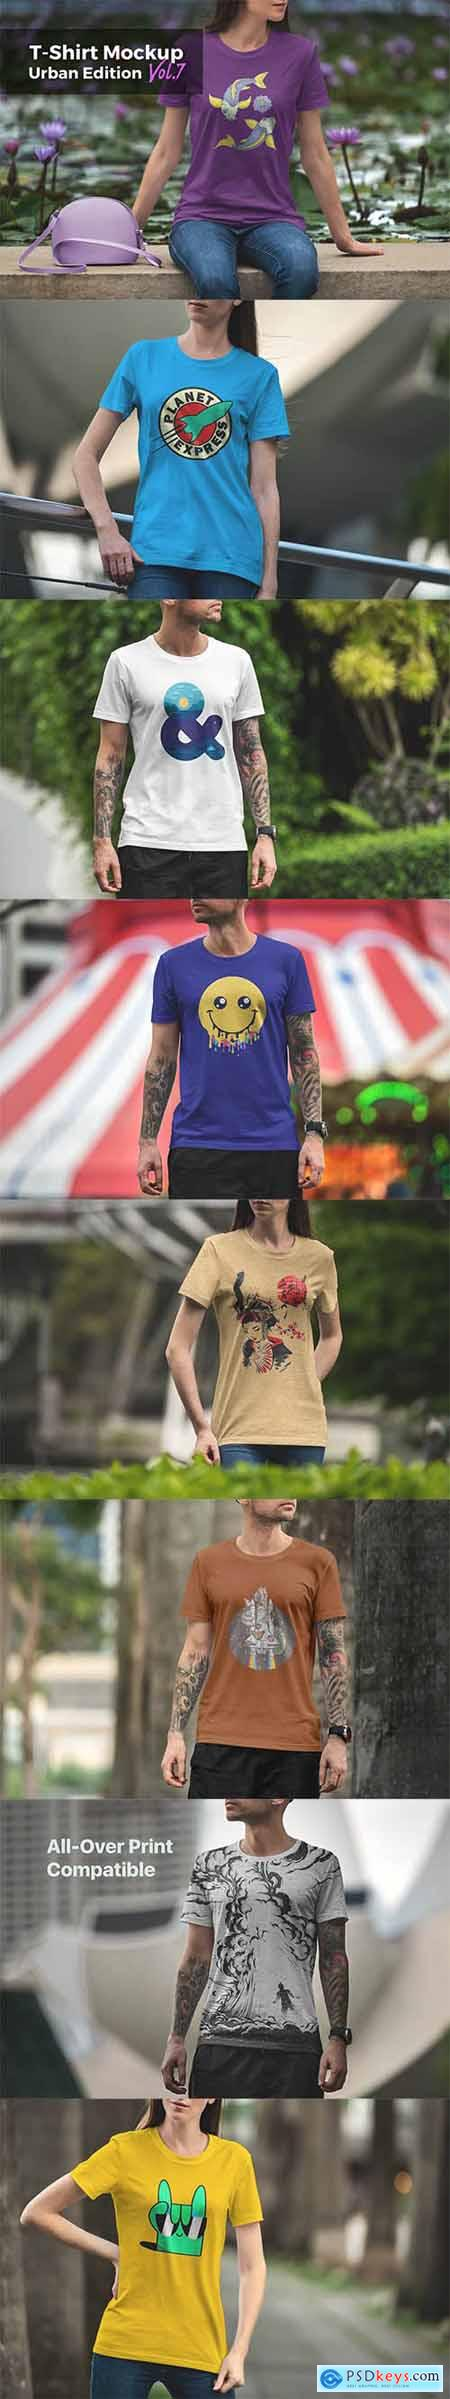 T-Shirt Mockup Urban Edition Vol7